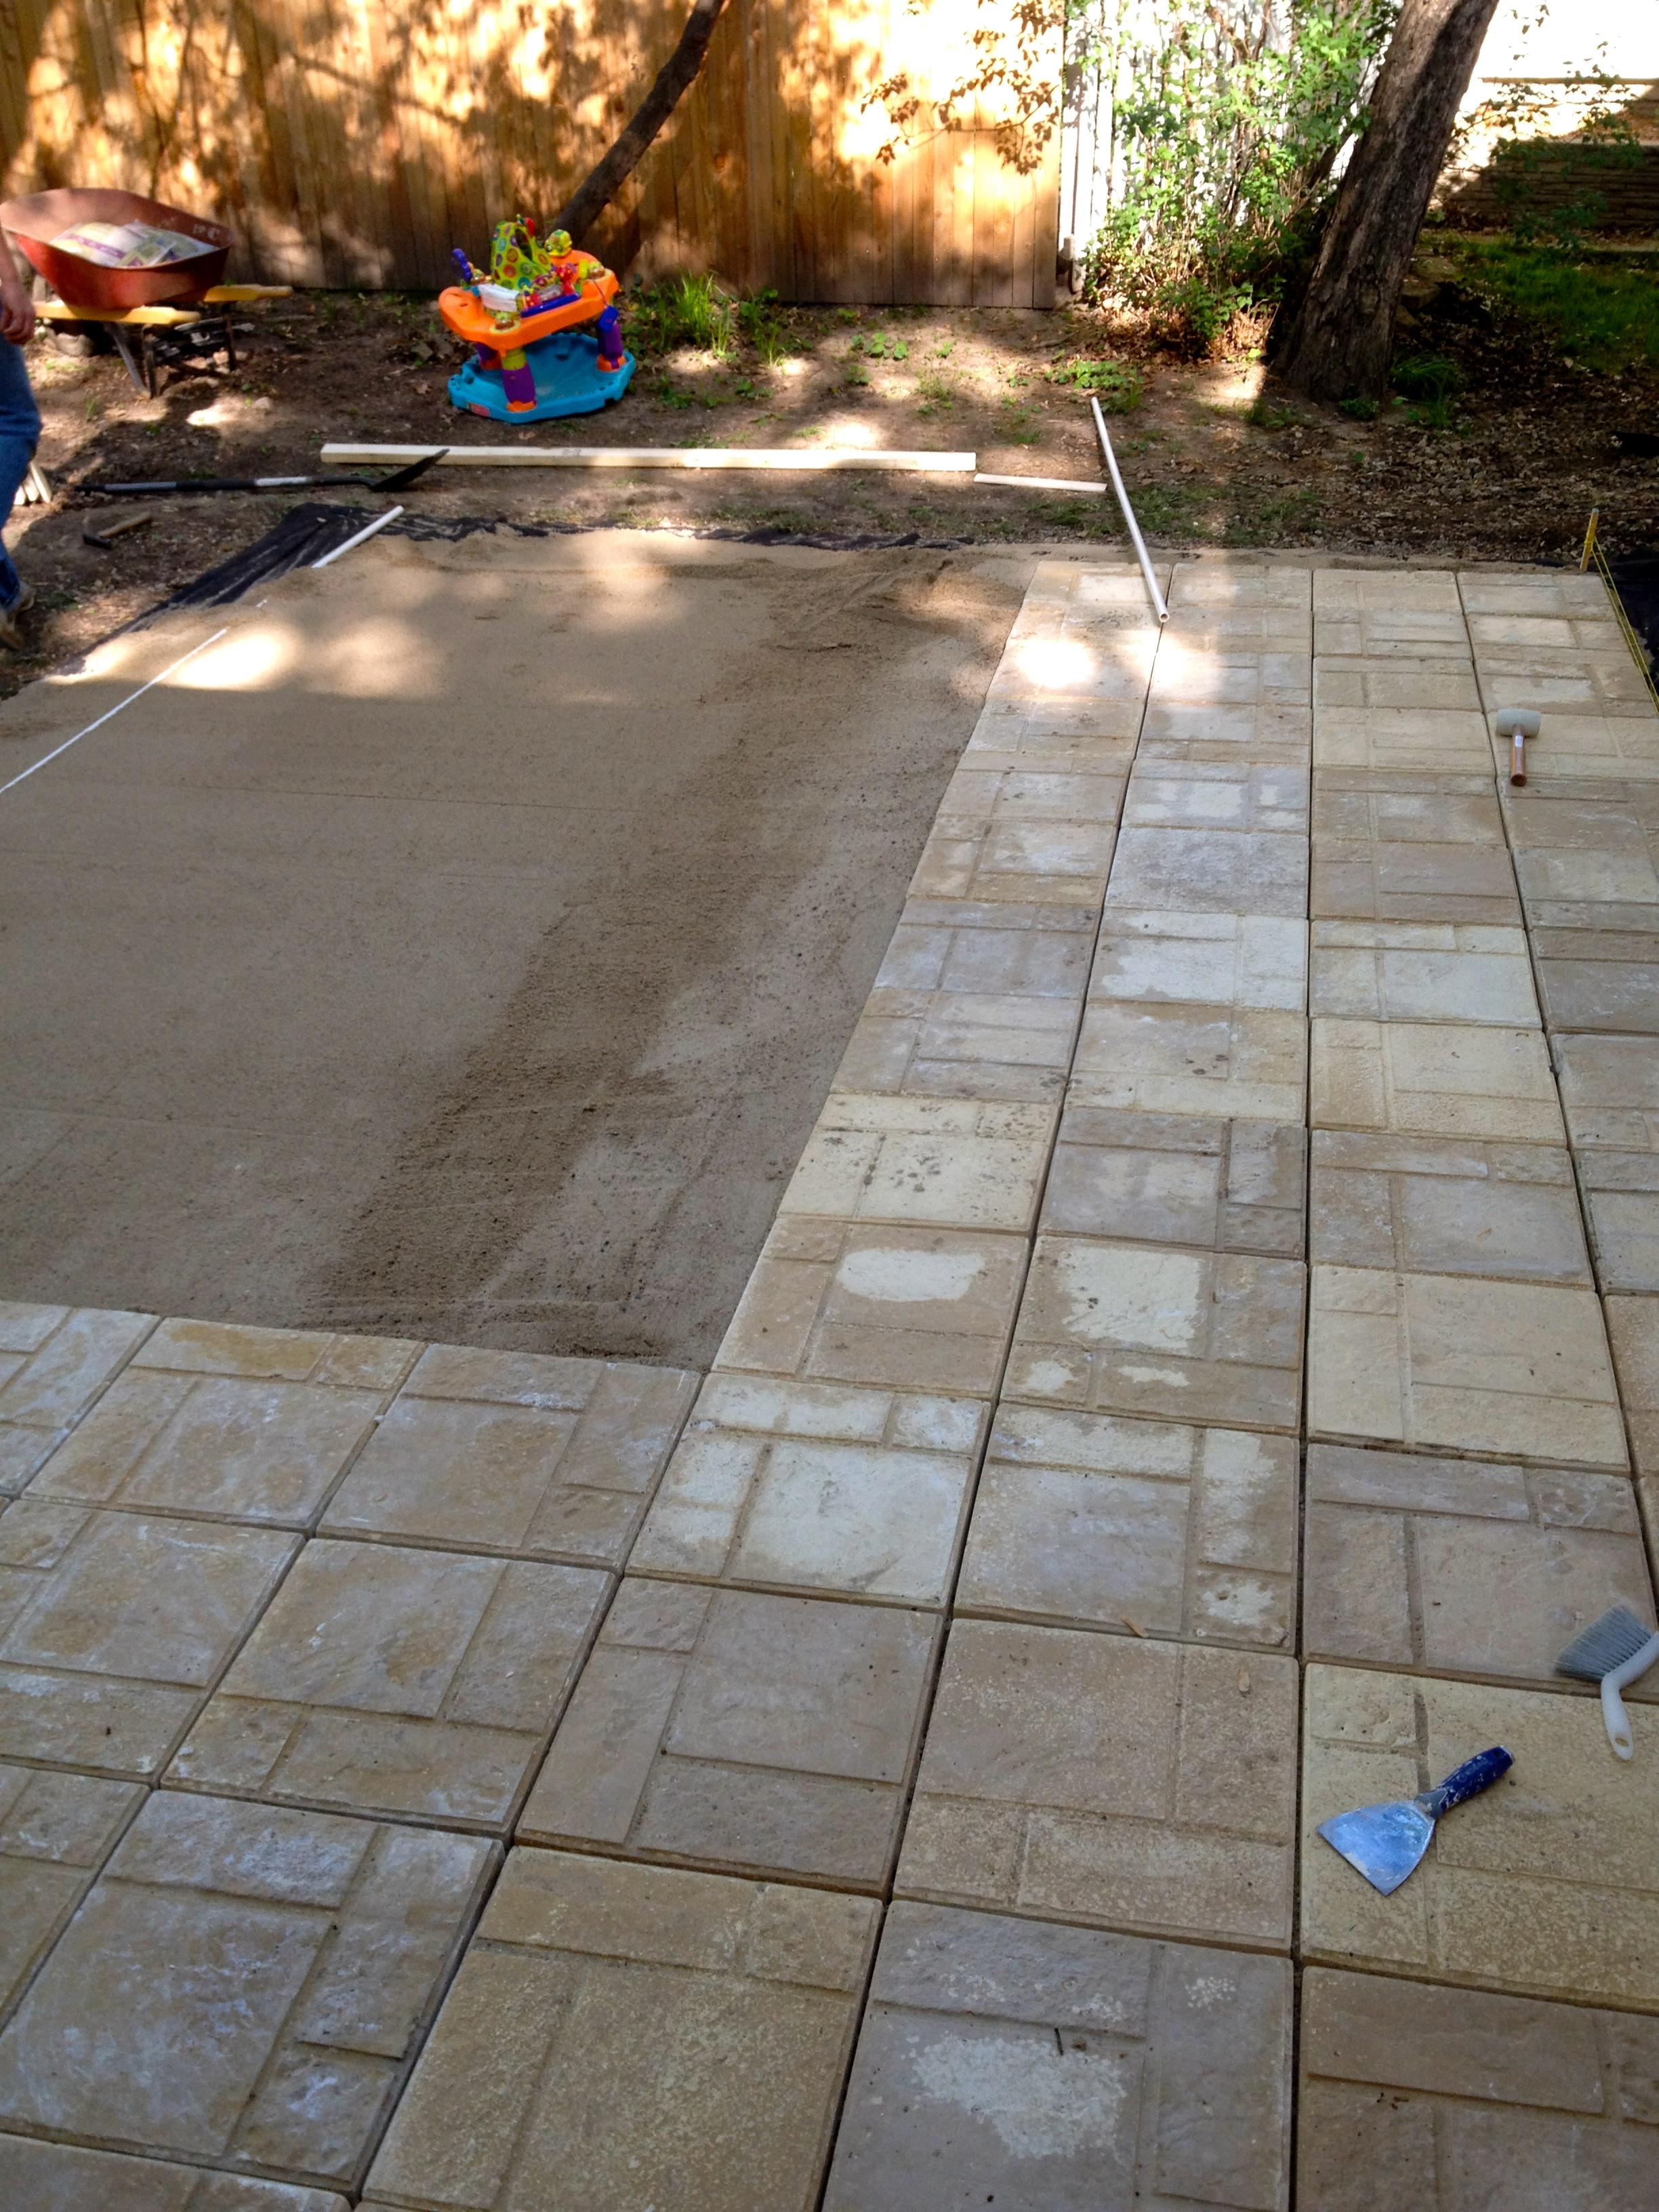 DIY Paver Patio | The Suburban Urbanist on Diy Concrete Patio Ideas id=61191